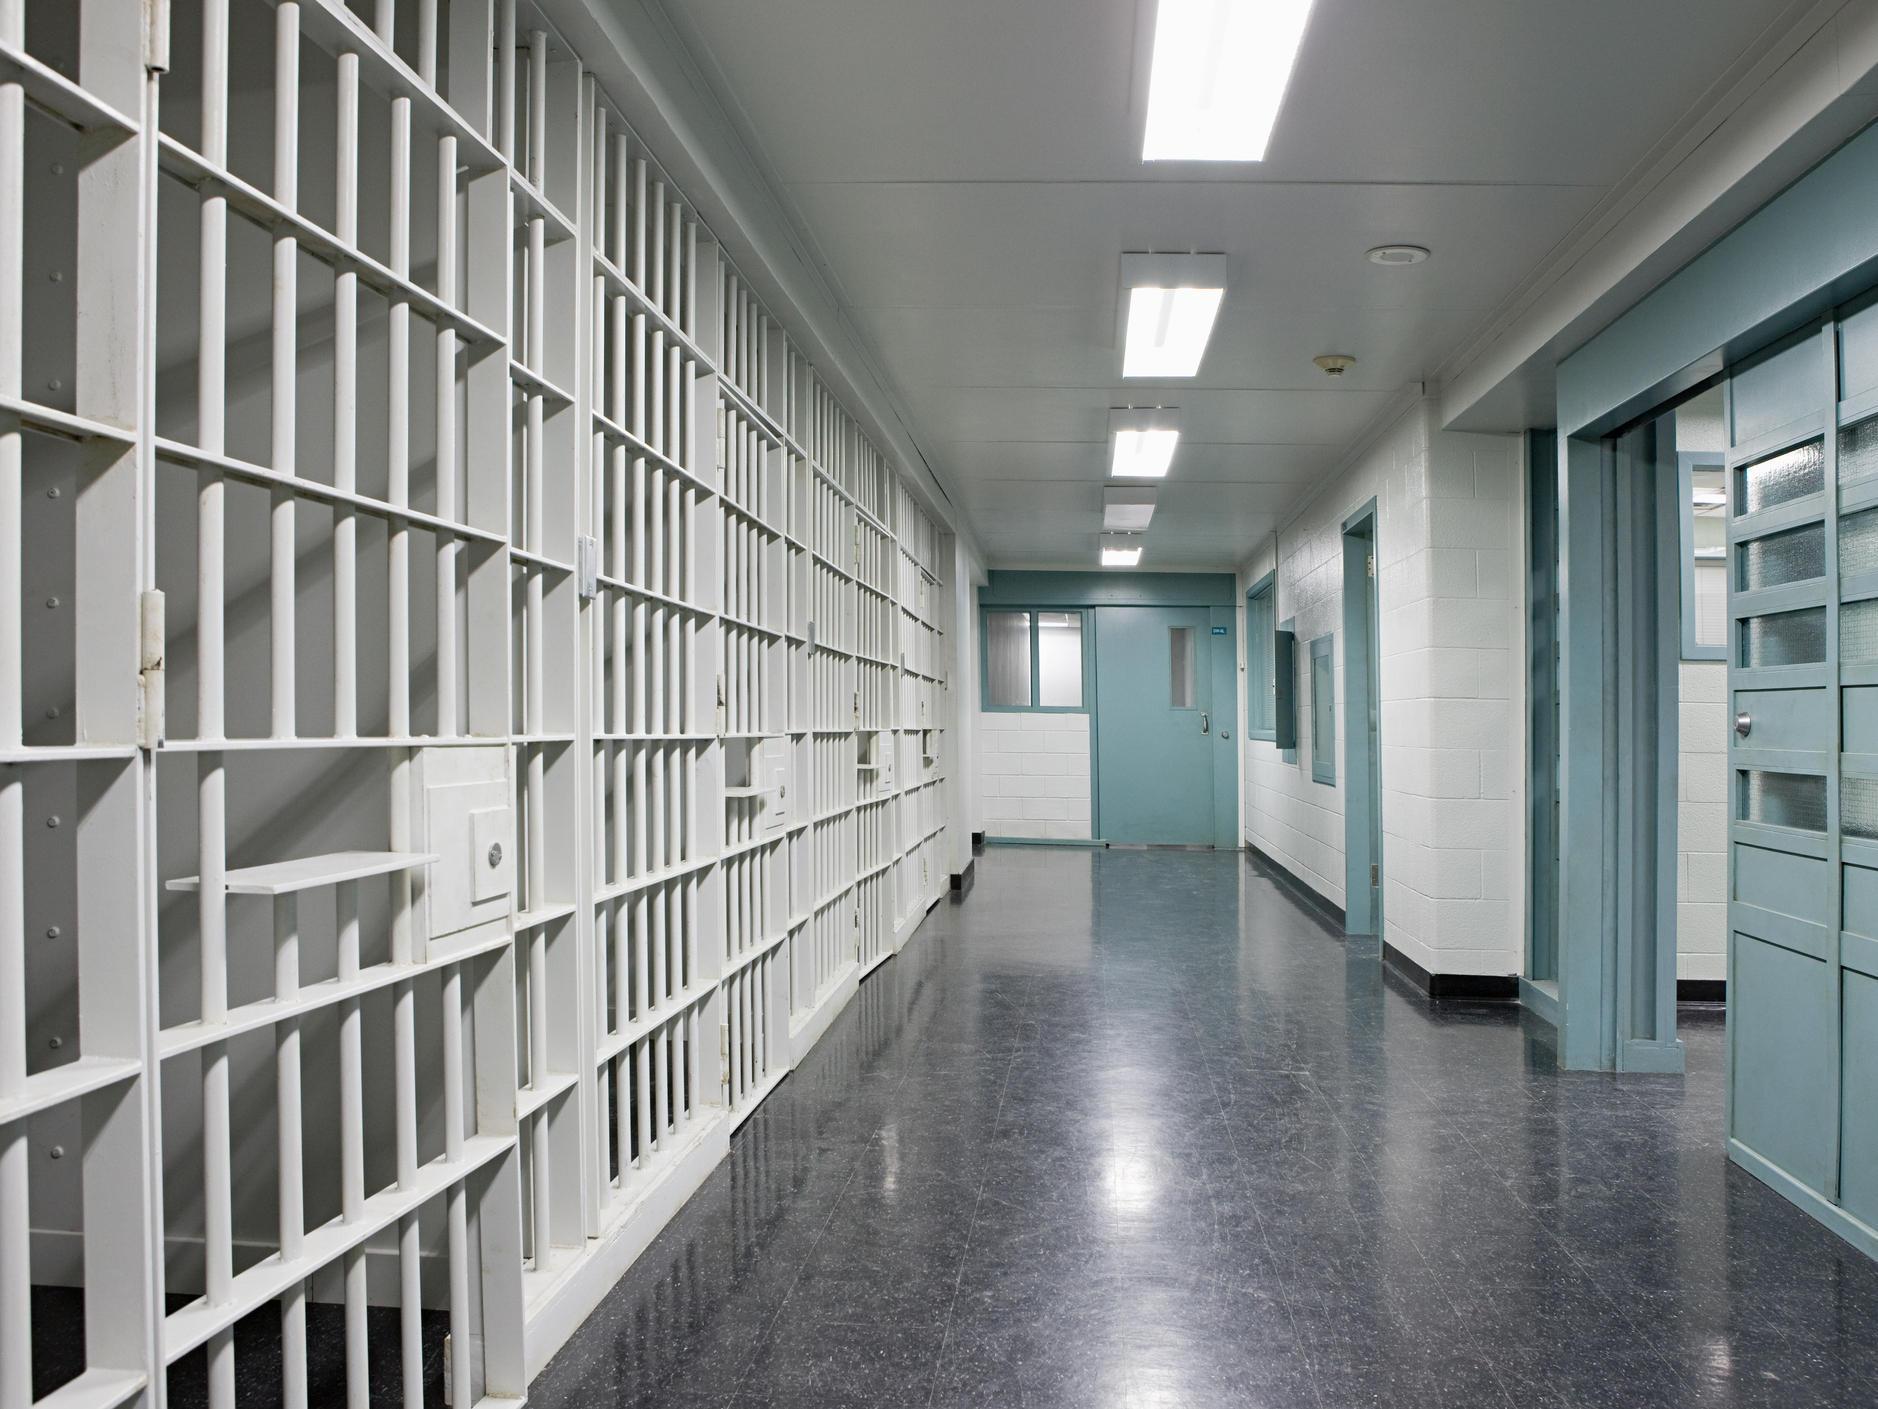 Image result for jail